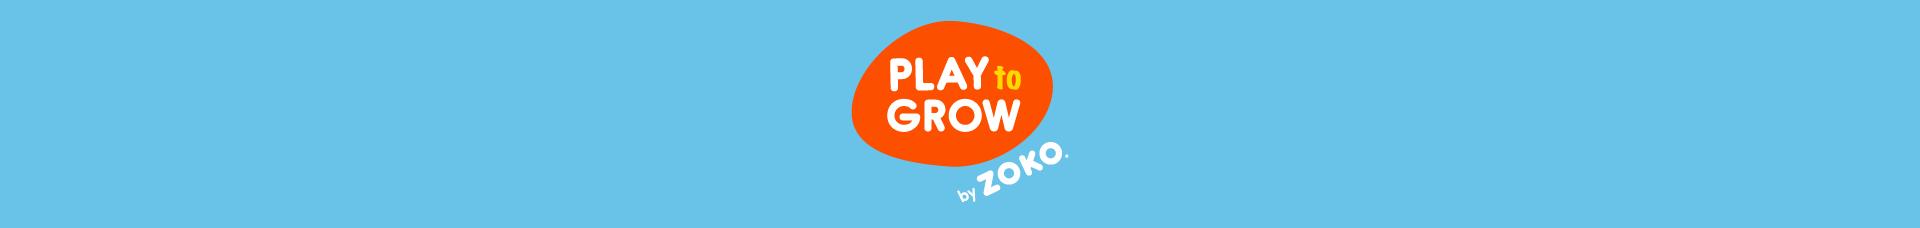 Play to Grow